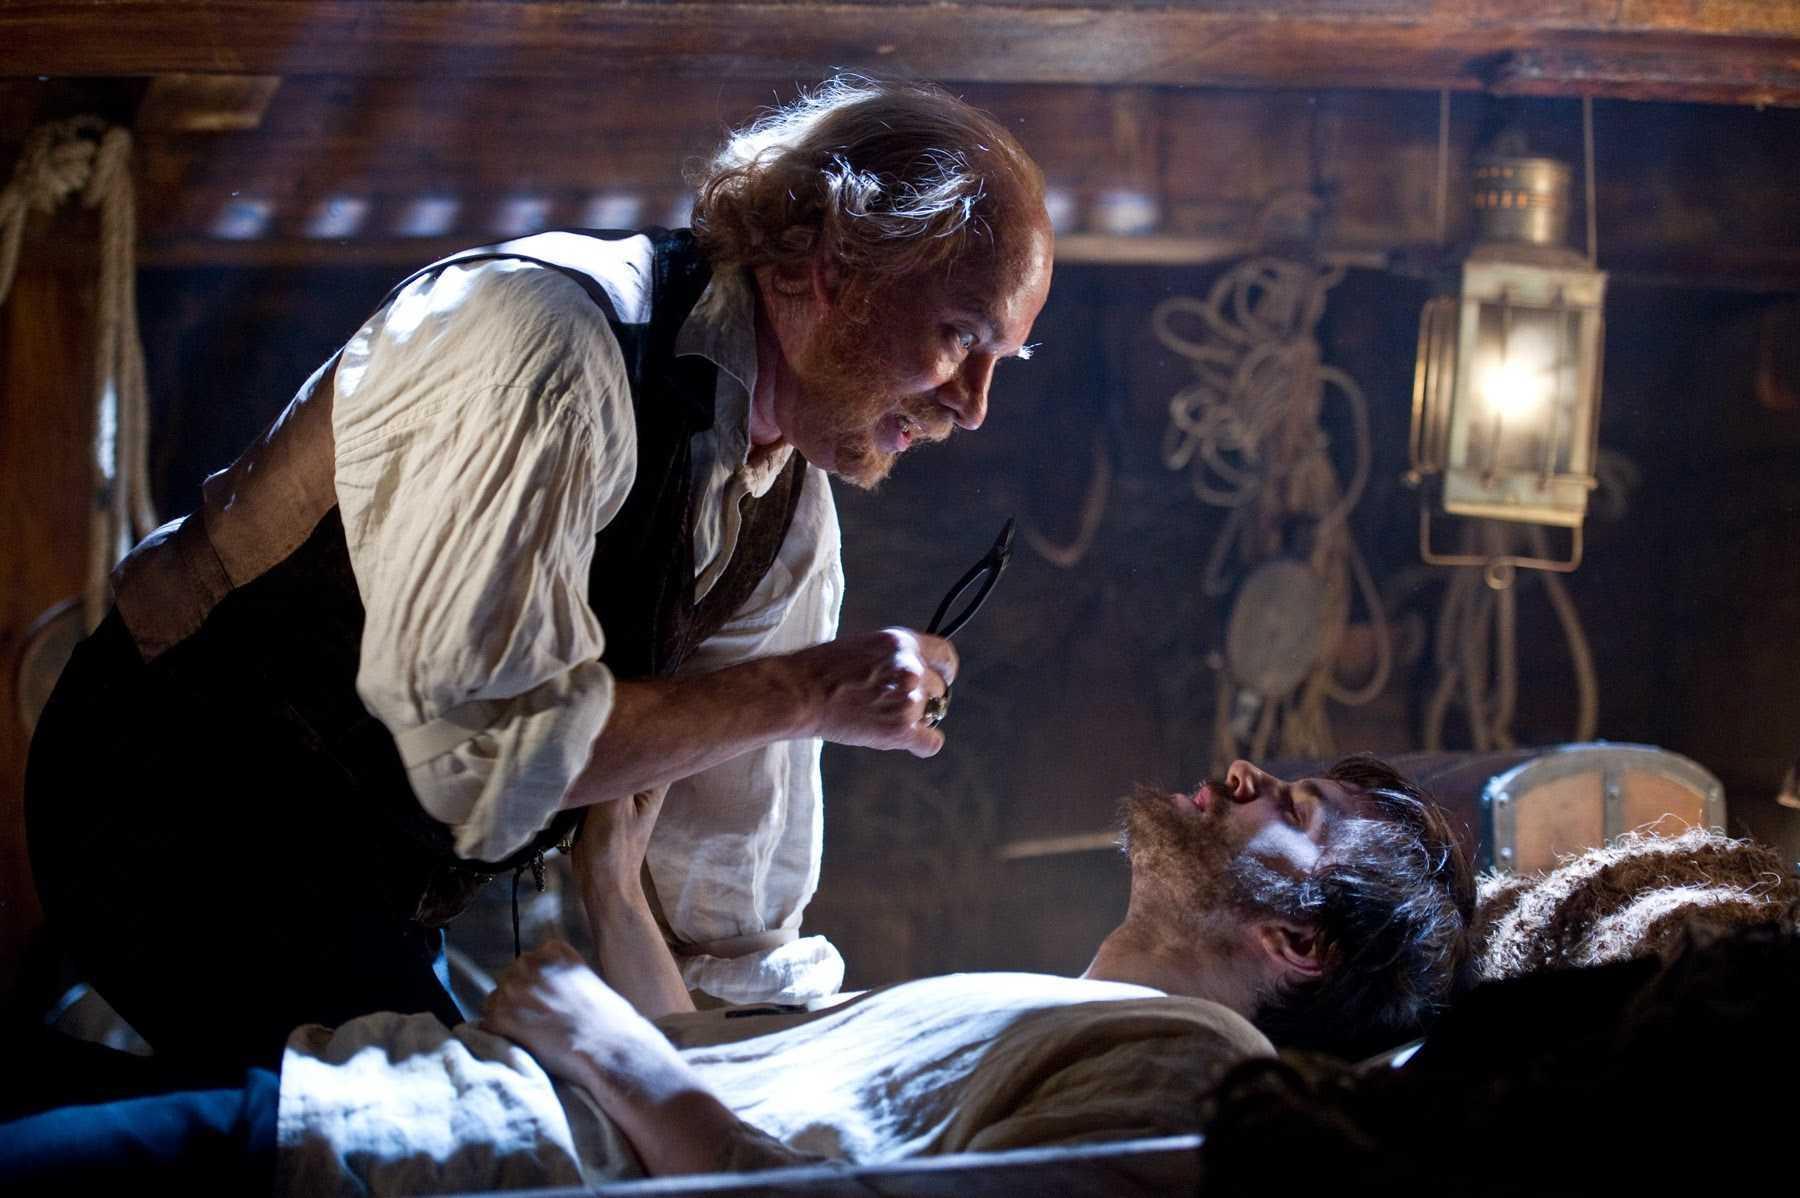 Dr Henry Goose (Tom Hanks) and Adam Ewing (Jim Sturgess) in Cloud Atlas (2012)